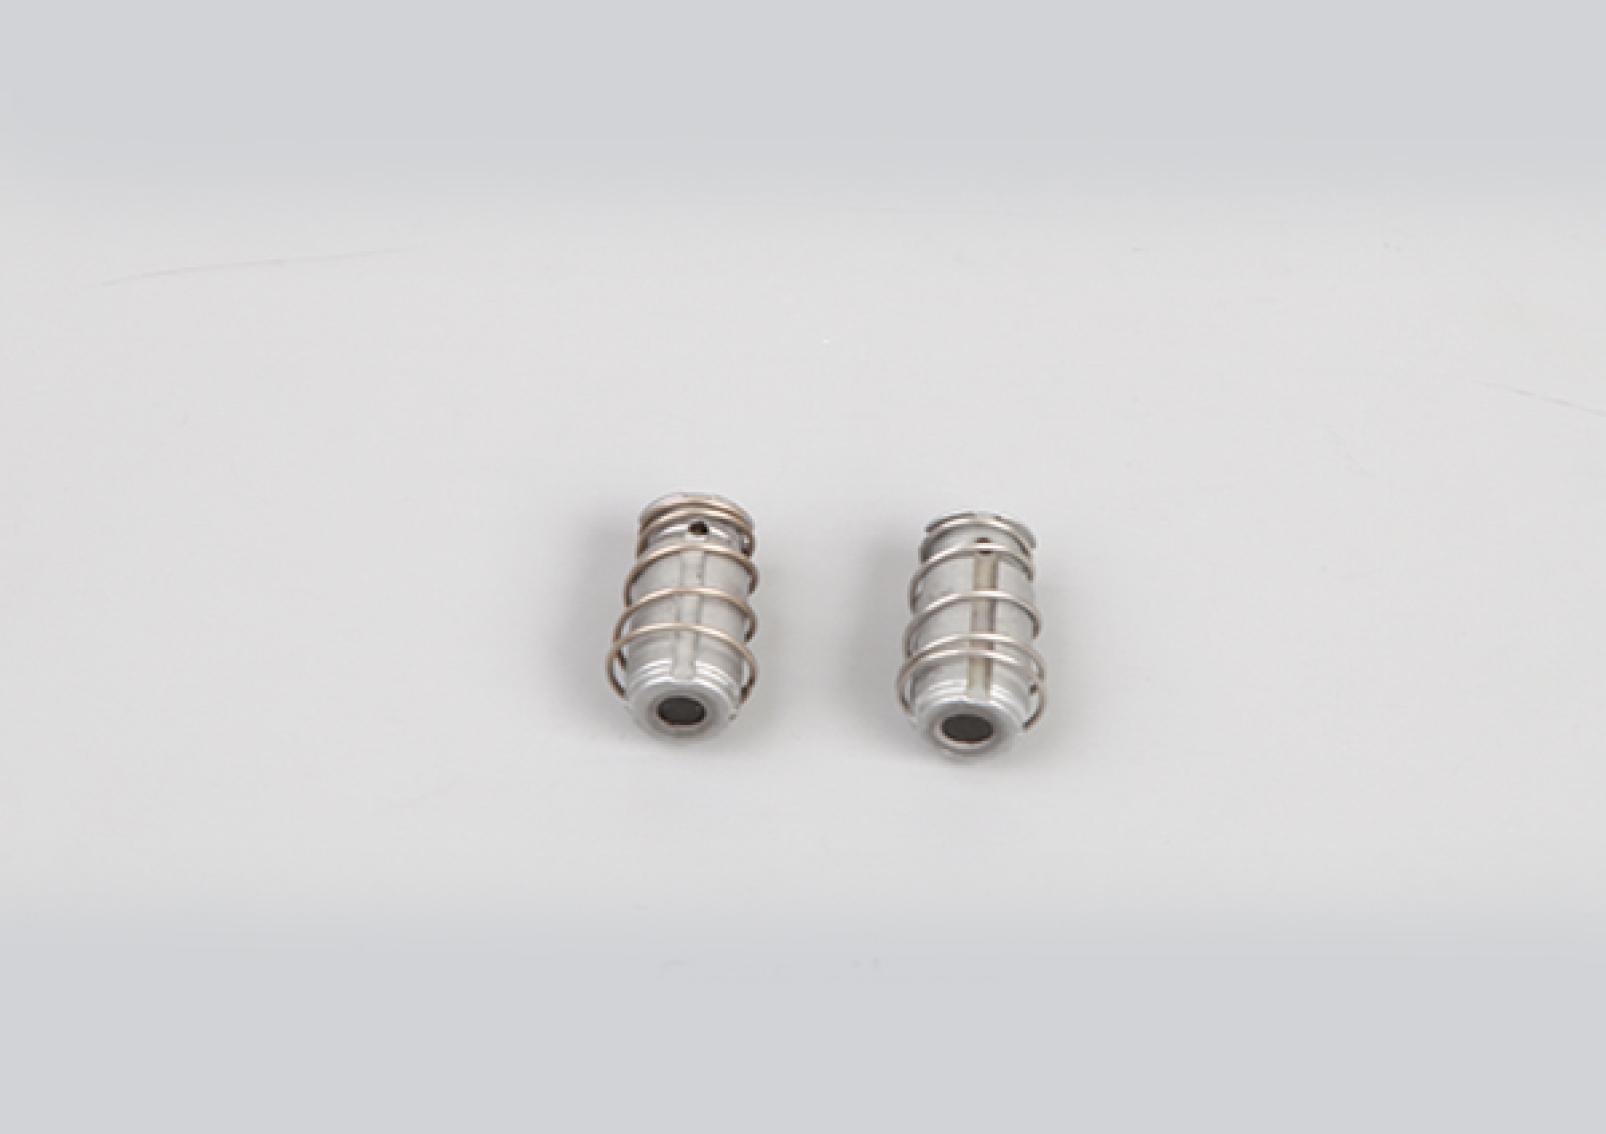 Gearbox Valve Repair Kit (Hard Valve), 4422302221